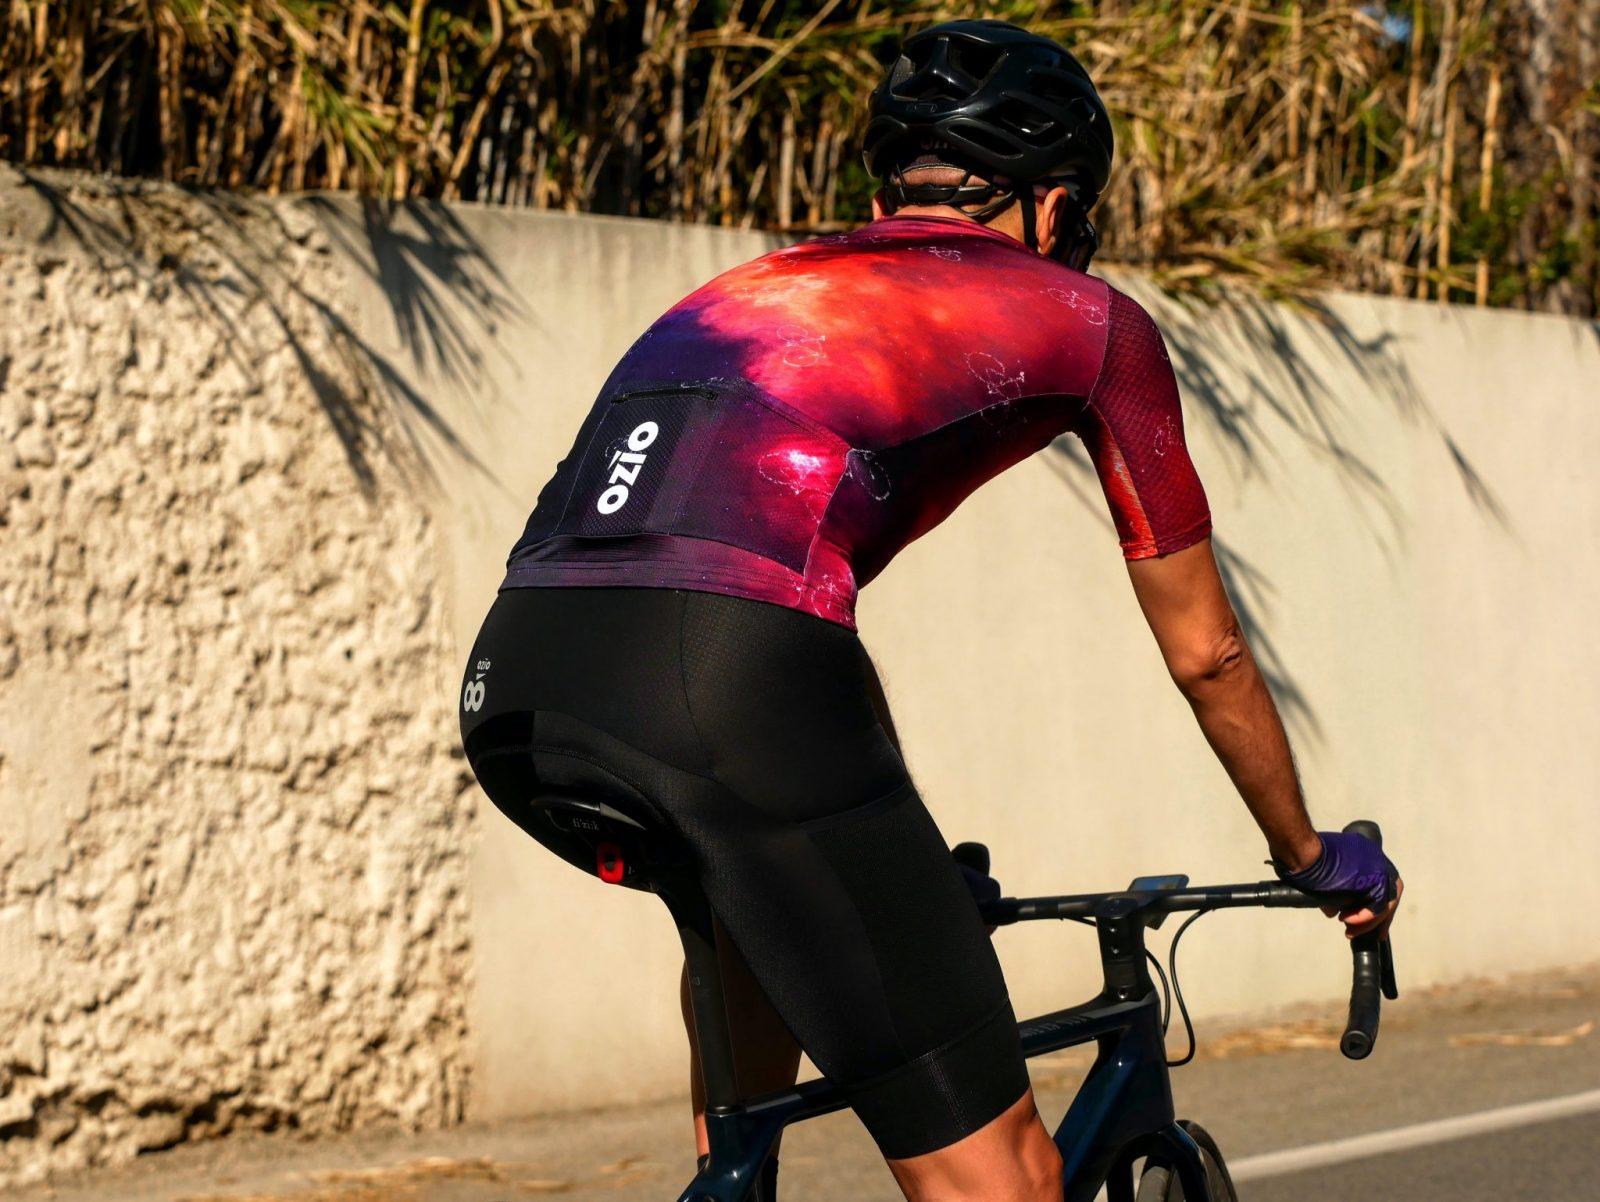 Maillot cycliste été CONSTELLATION vue de dos